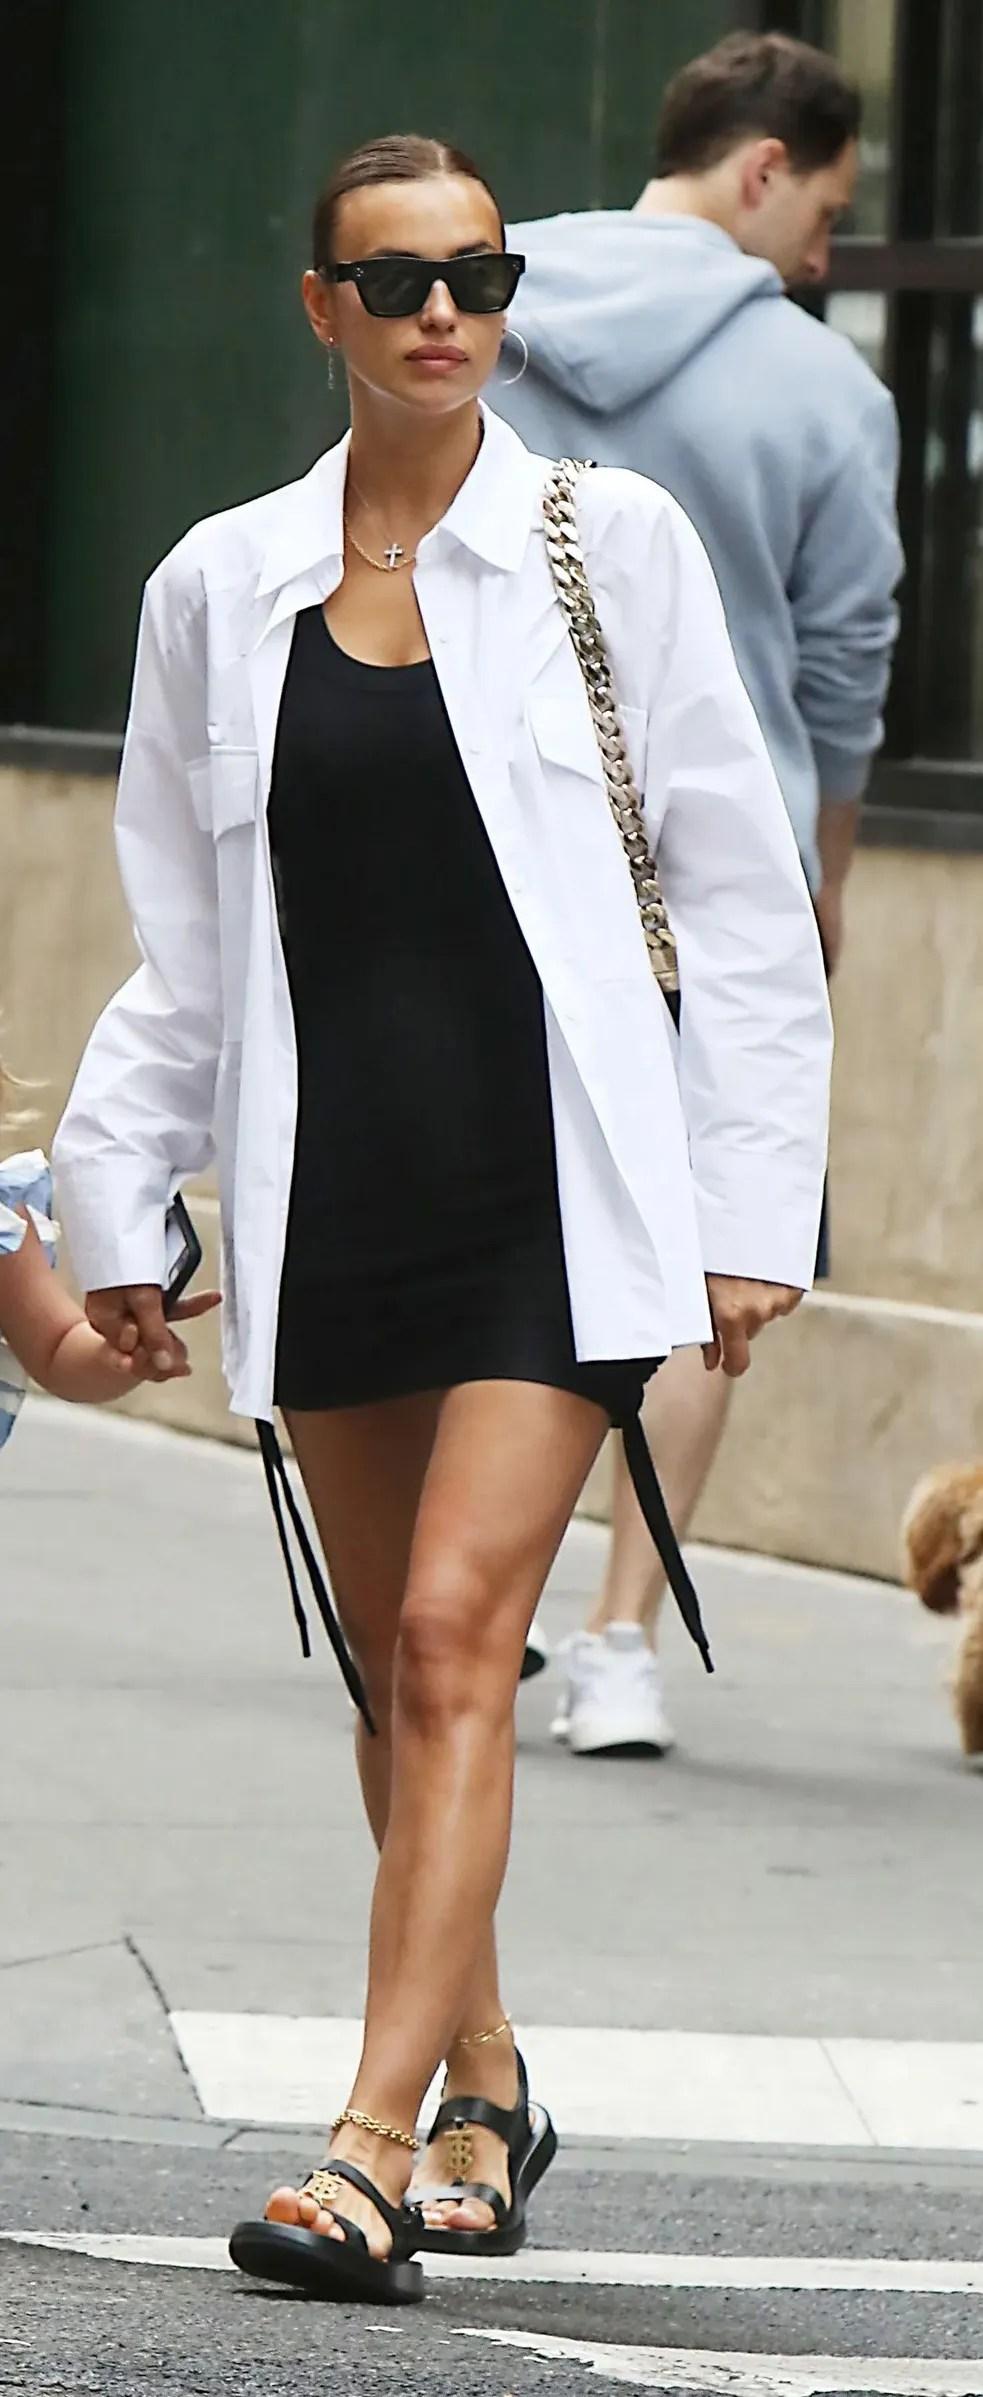 Irina Shayk wearing bodycon LBD with white button up